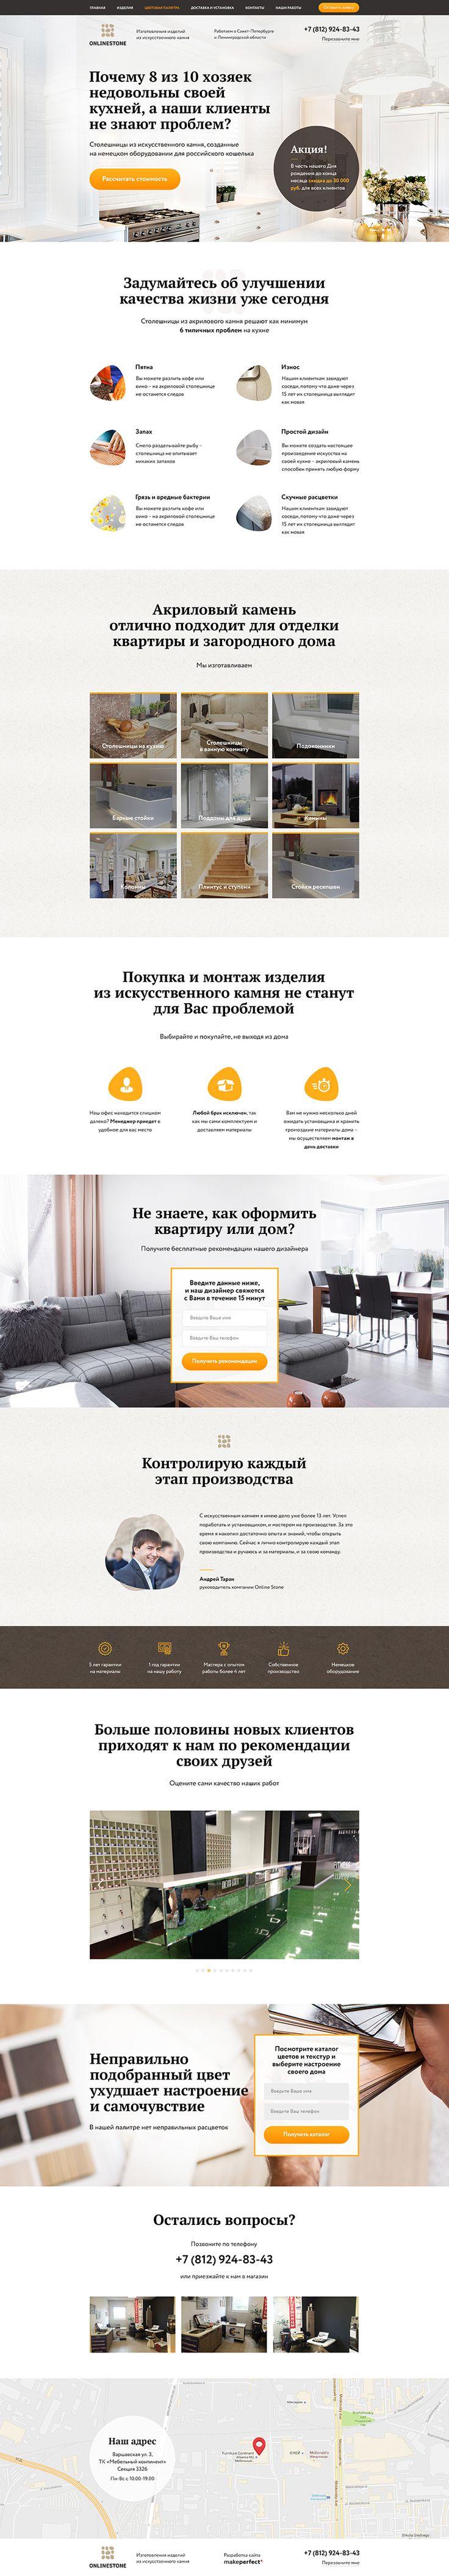 Olga Gunko on Behance